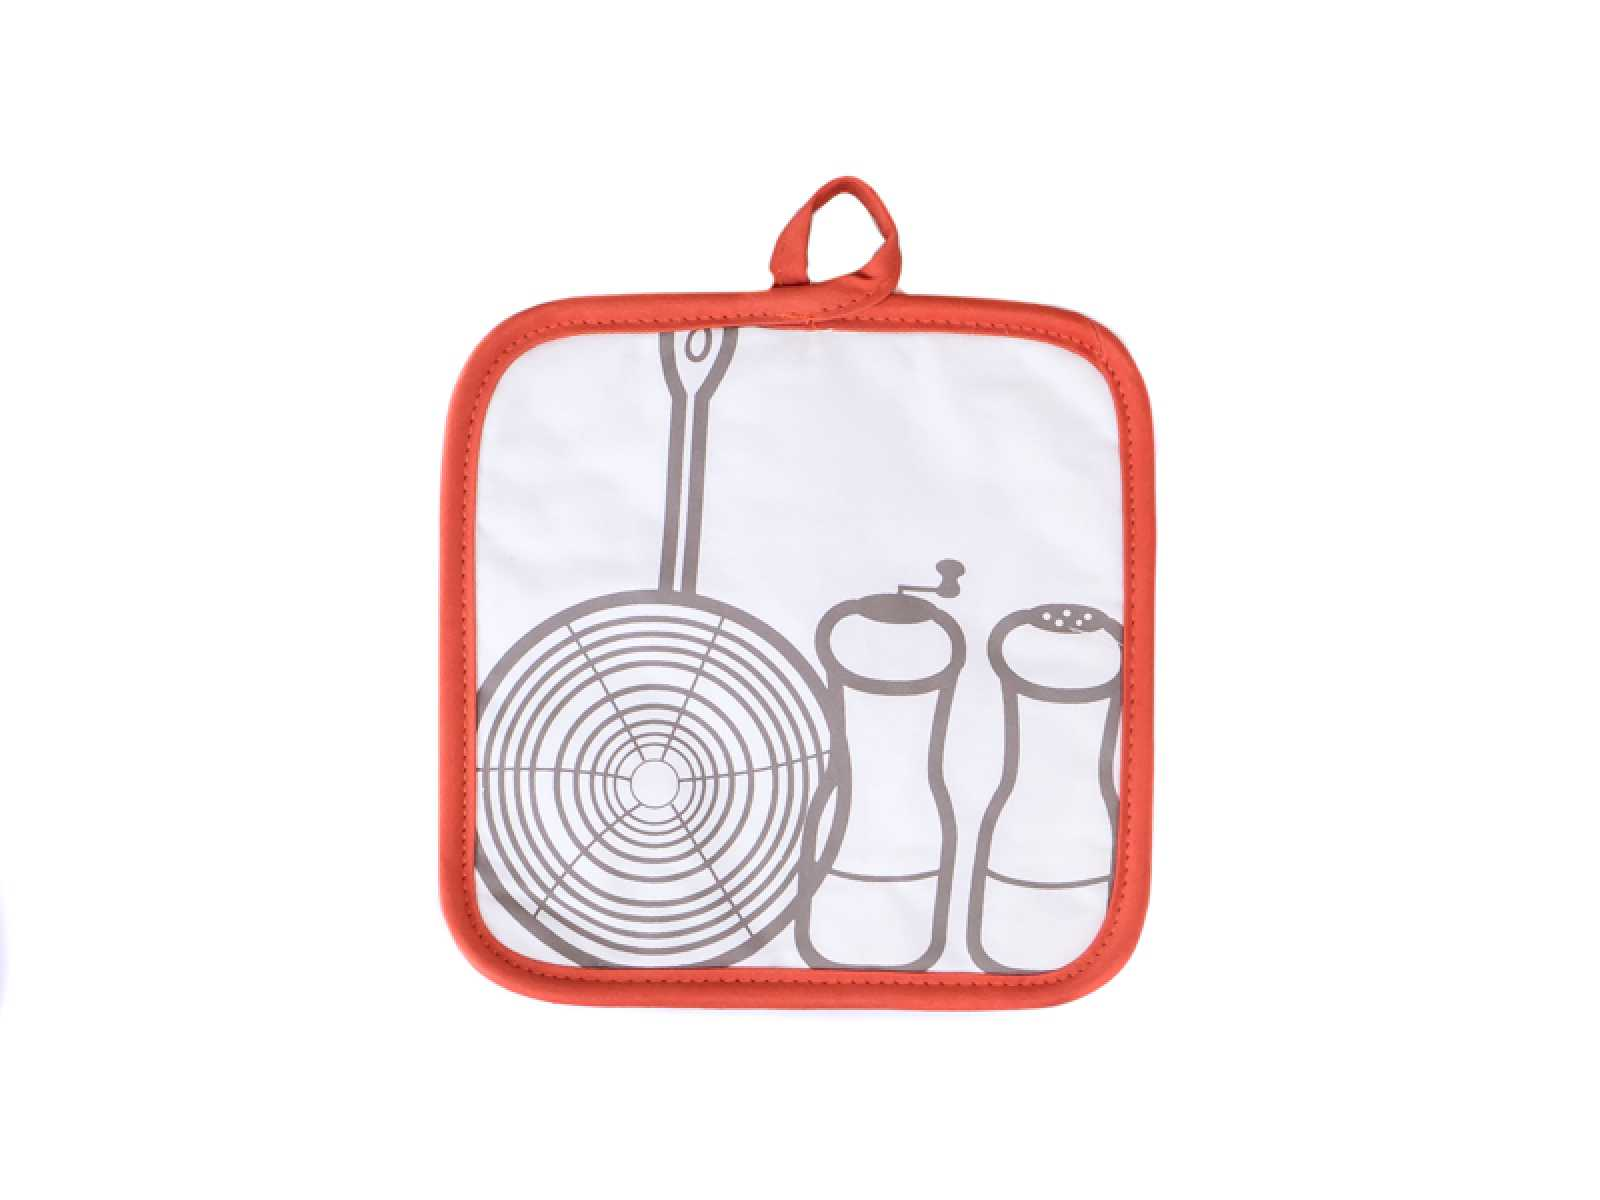 Онлайн каталог PROMENU: Прихватка кухонная Winkler FANTASY ORANGE, 20х20 см, белый с оранжевой окантовкой Winkler 5075734000